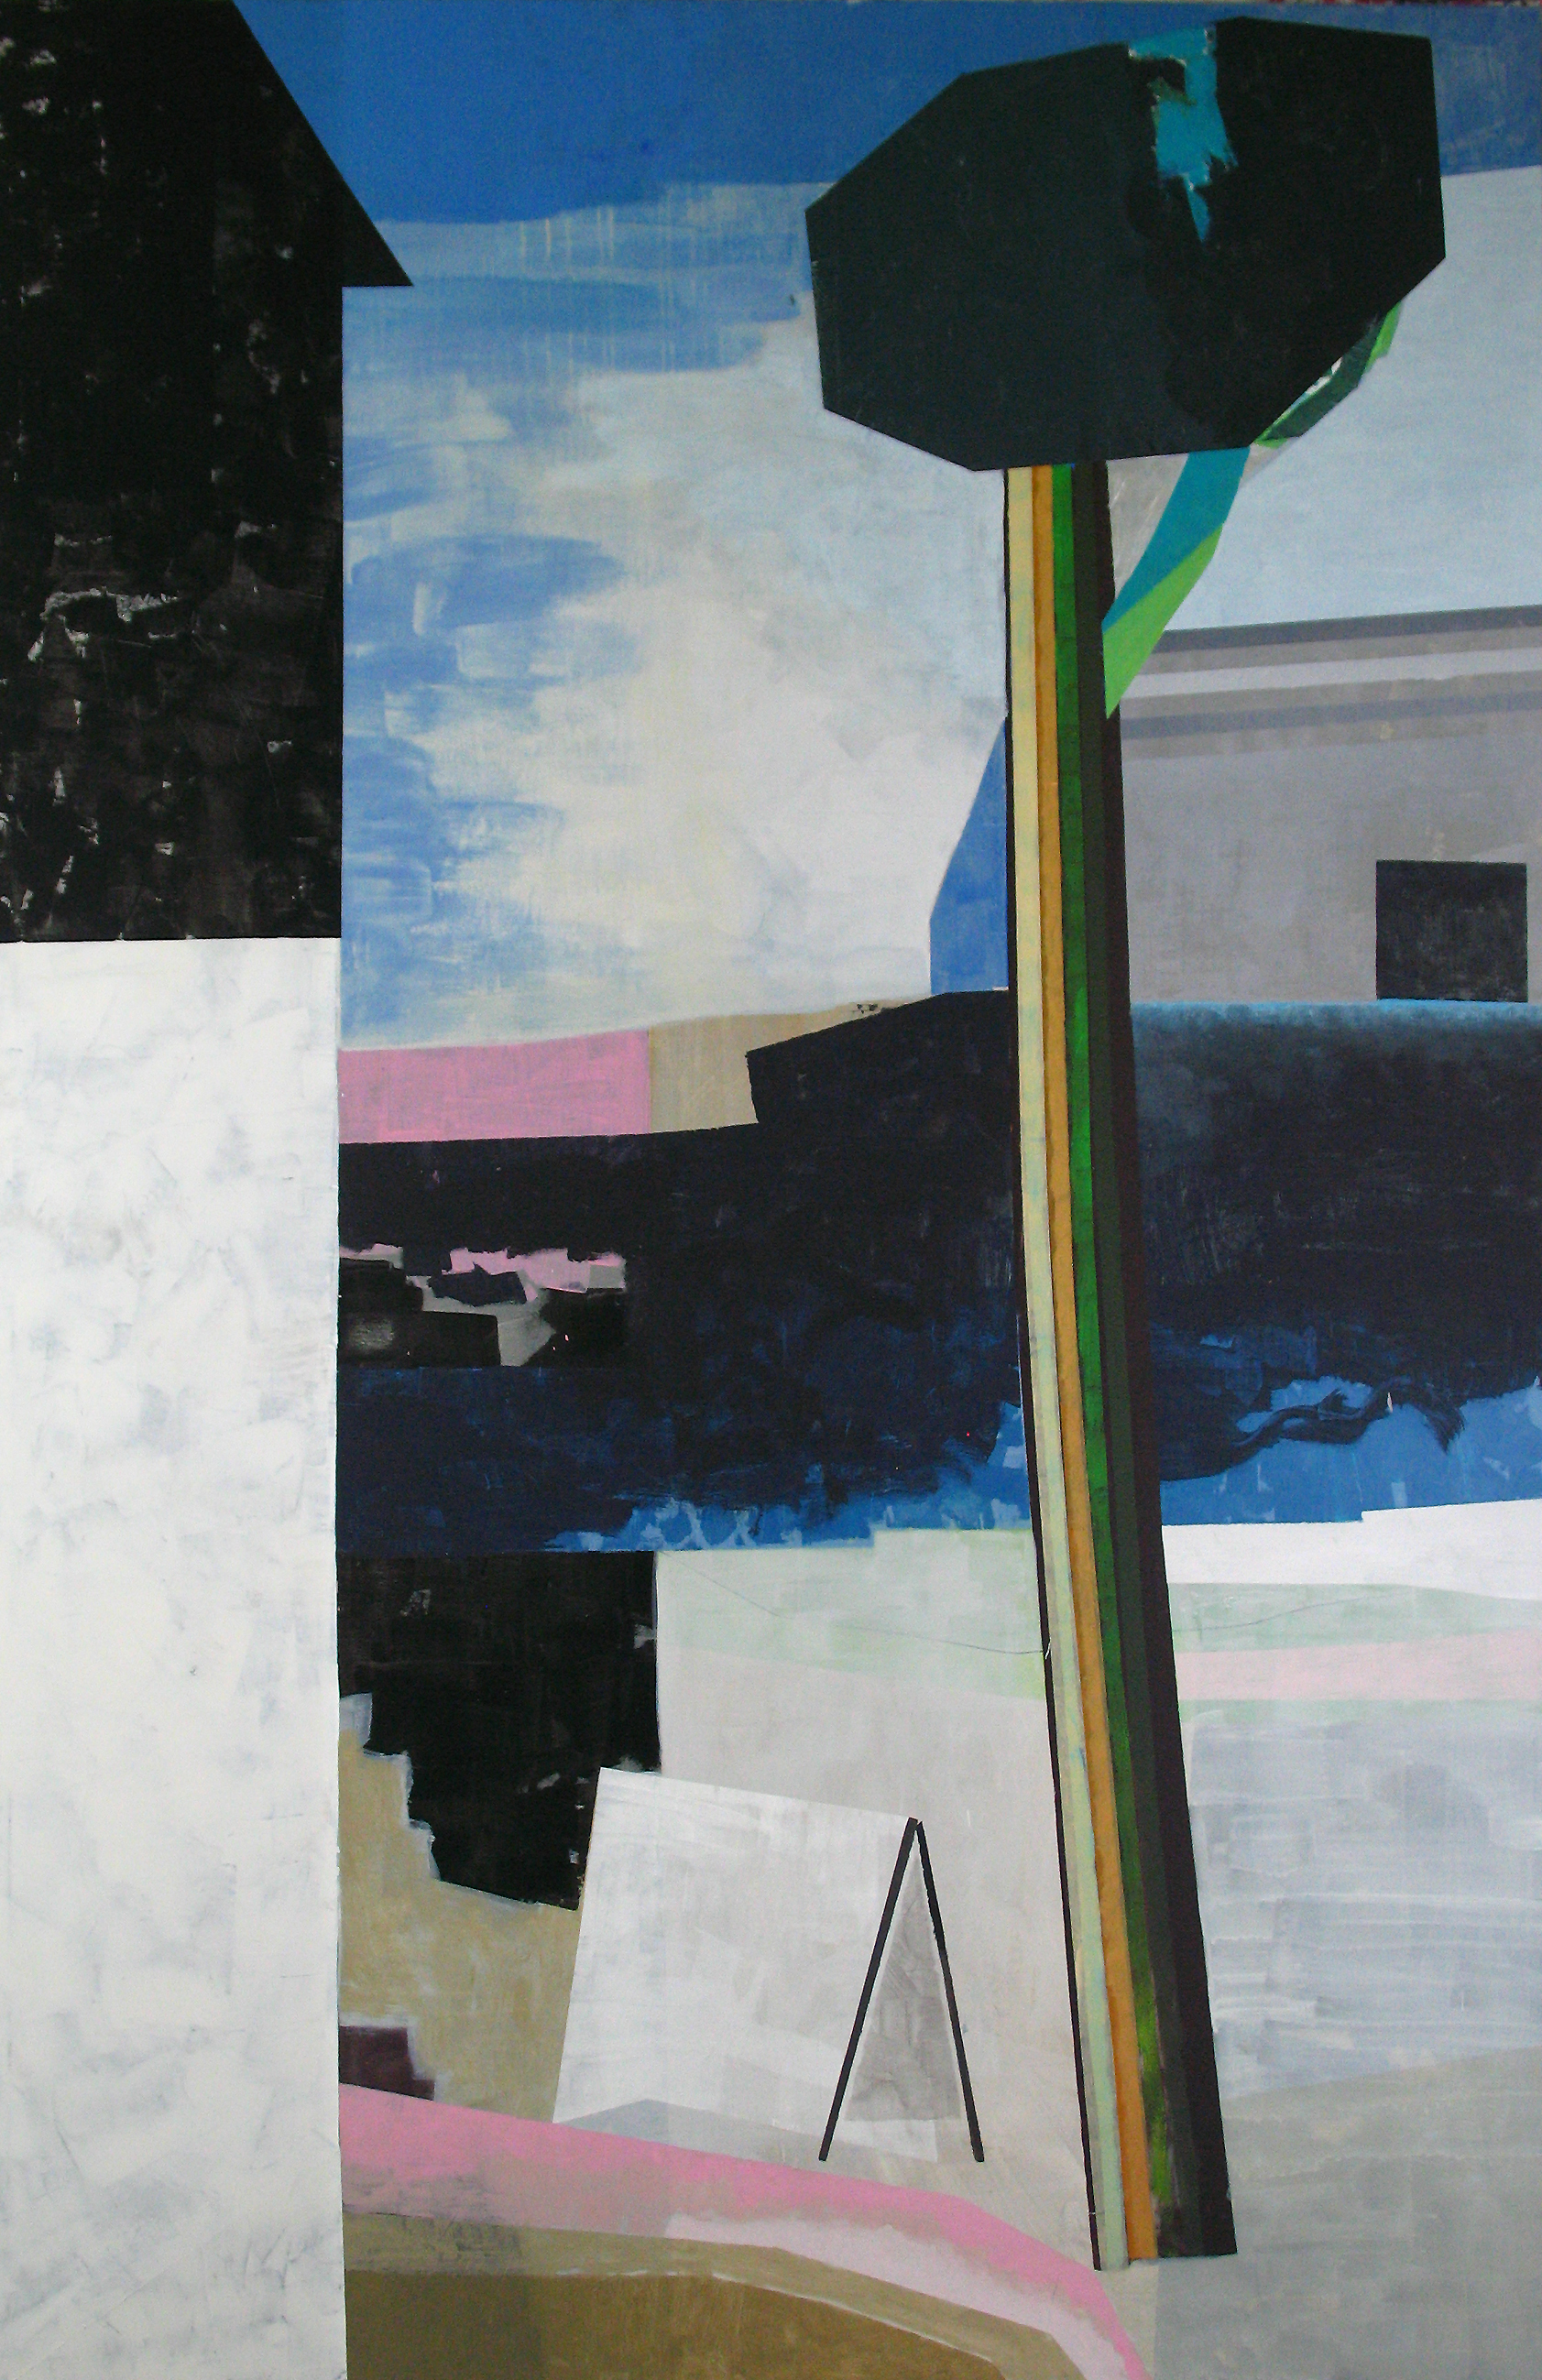 OLIVER GRÖNE,  Il pino sul mare , 2017, Öl und Acryl auf Leinwand, 220 × 145 cm